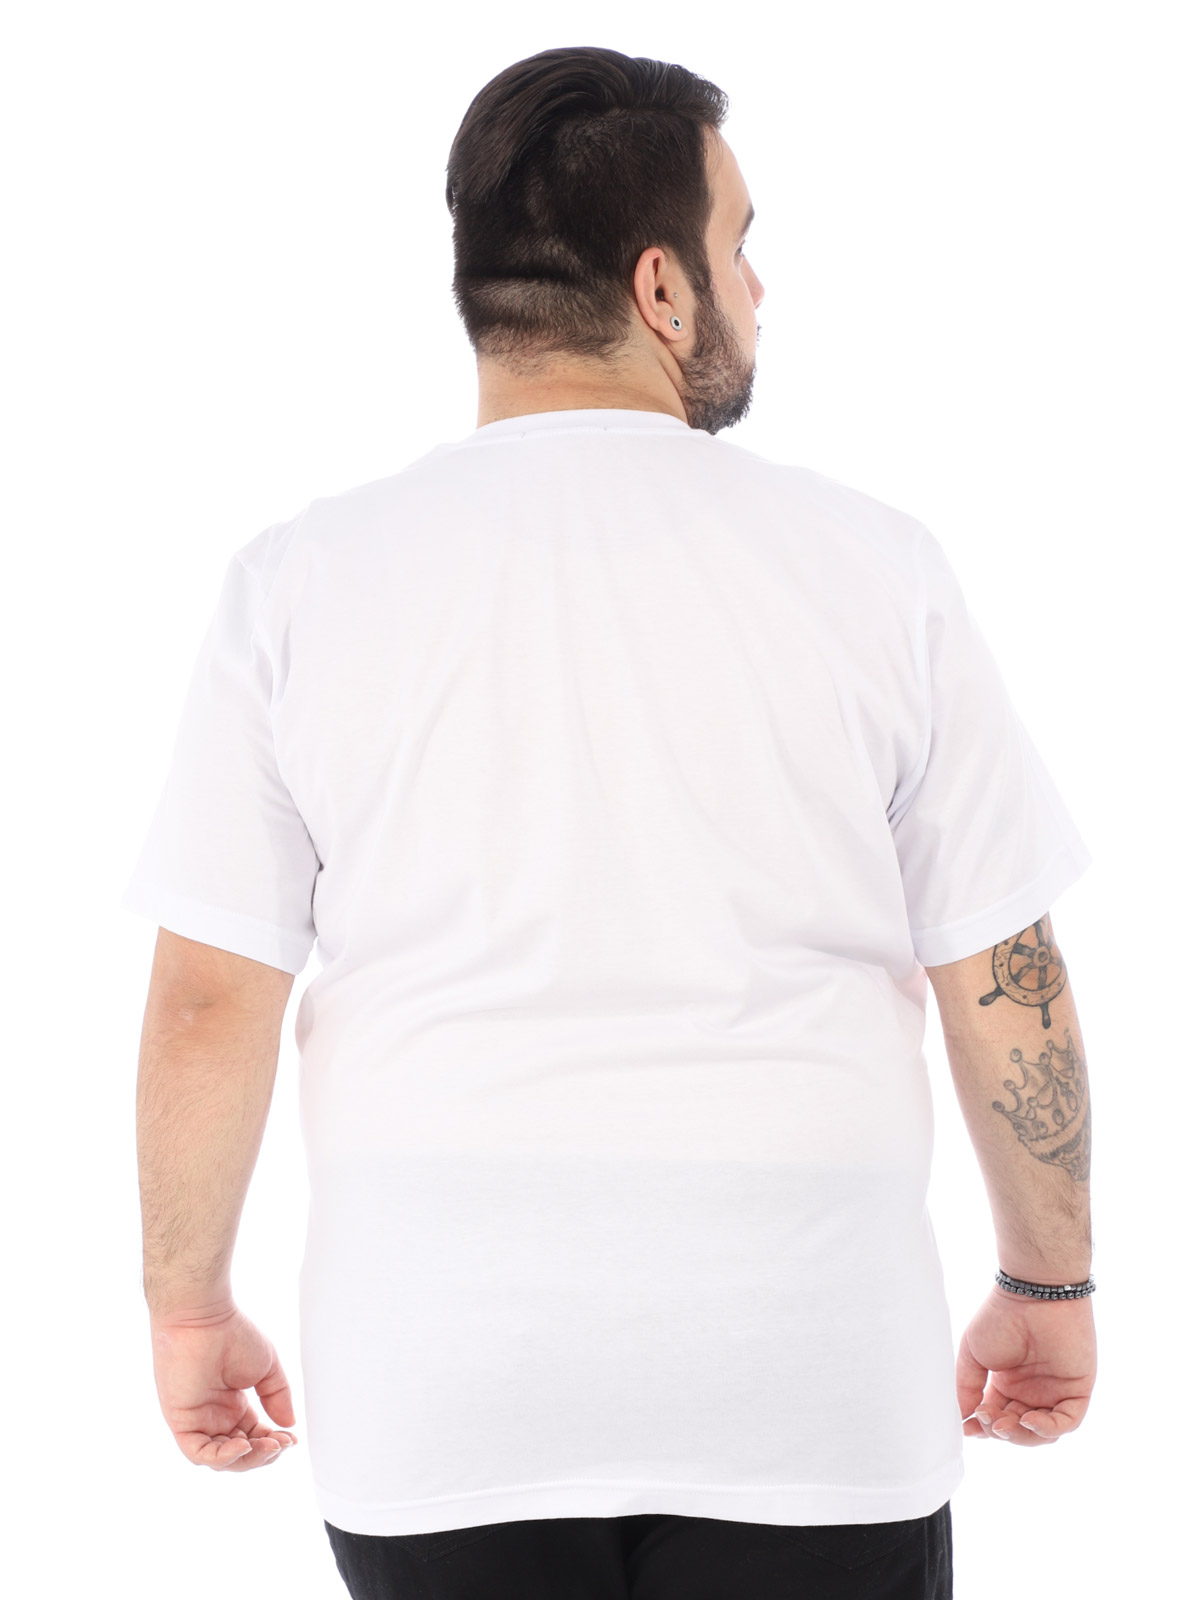 Camiseta Plus Size Masculina Estampada Bear Anistia Branca